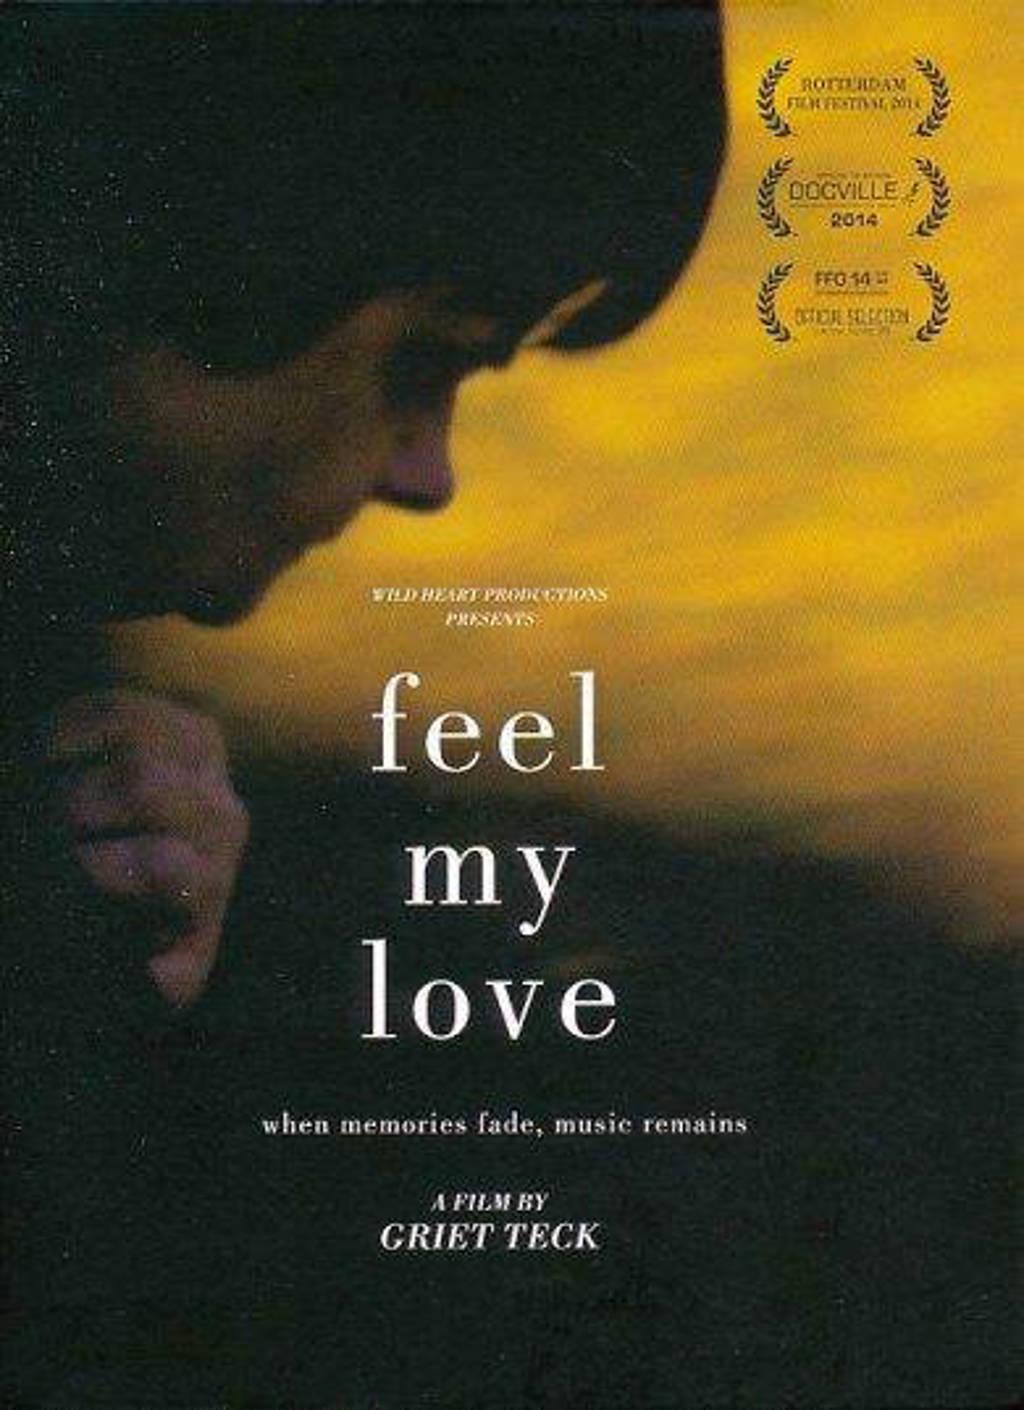 Feel my love (DVD)